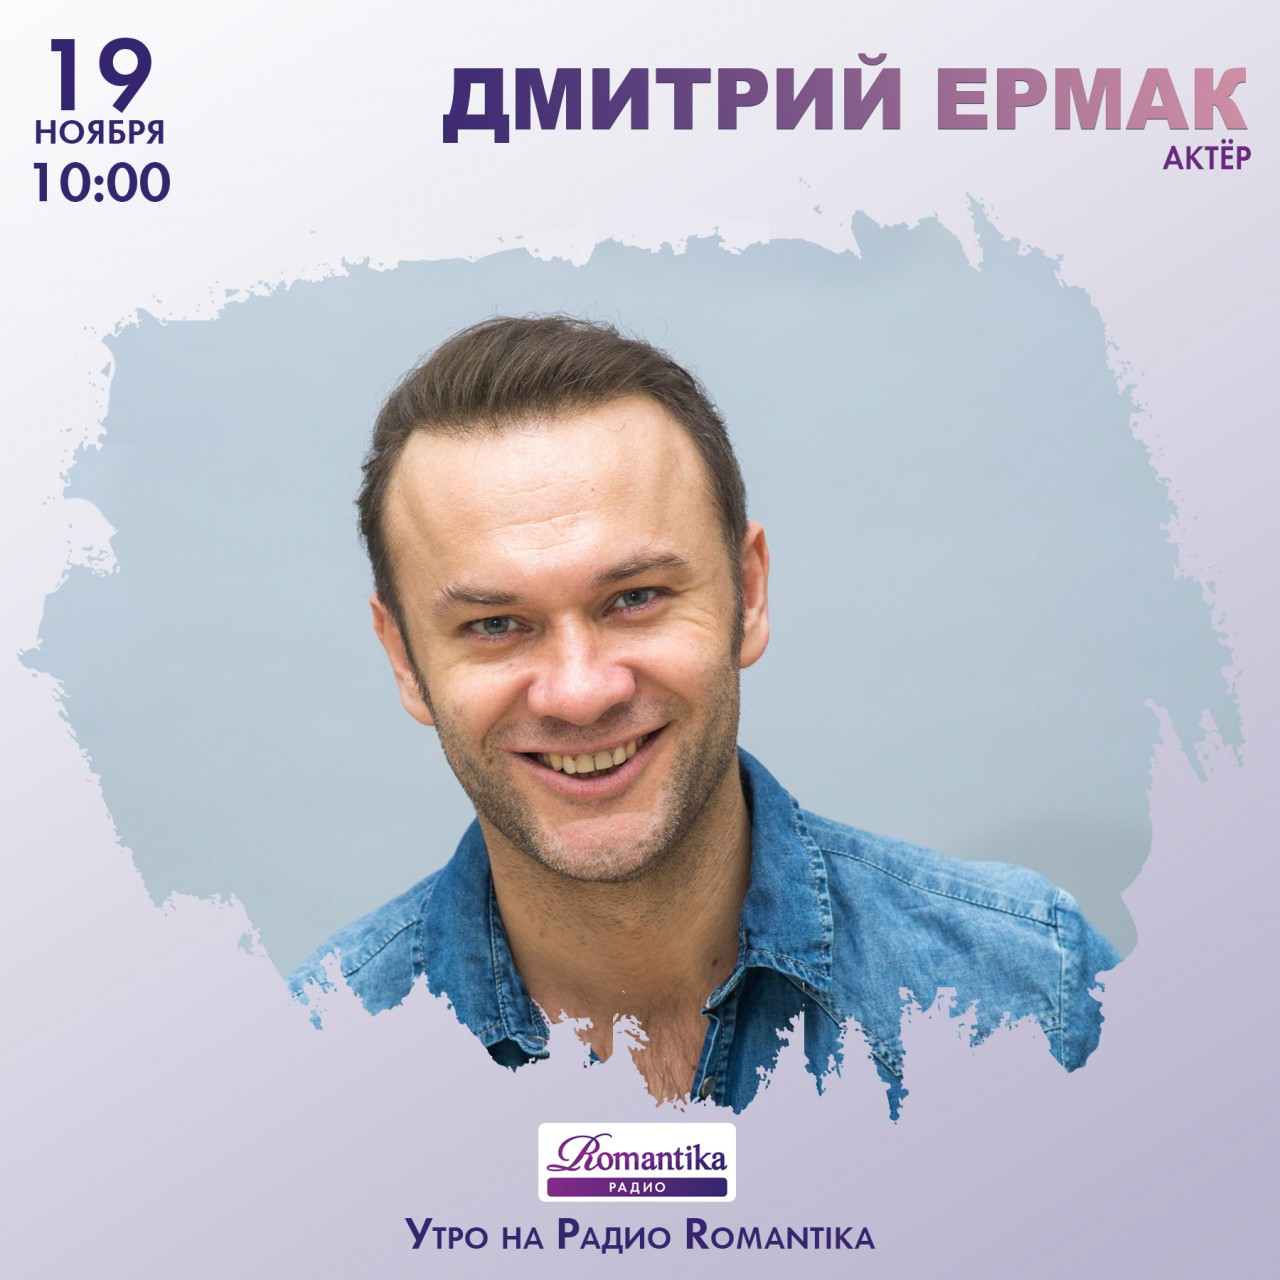 Радио Romantika: 19 ноября - актёр Дмитрий Ермак